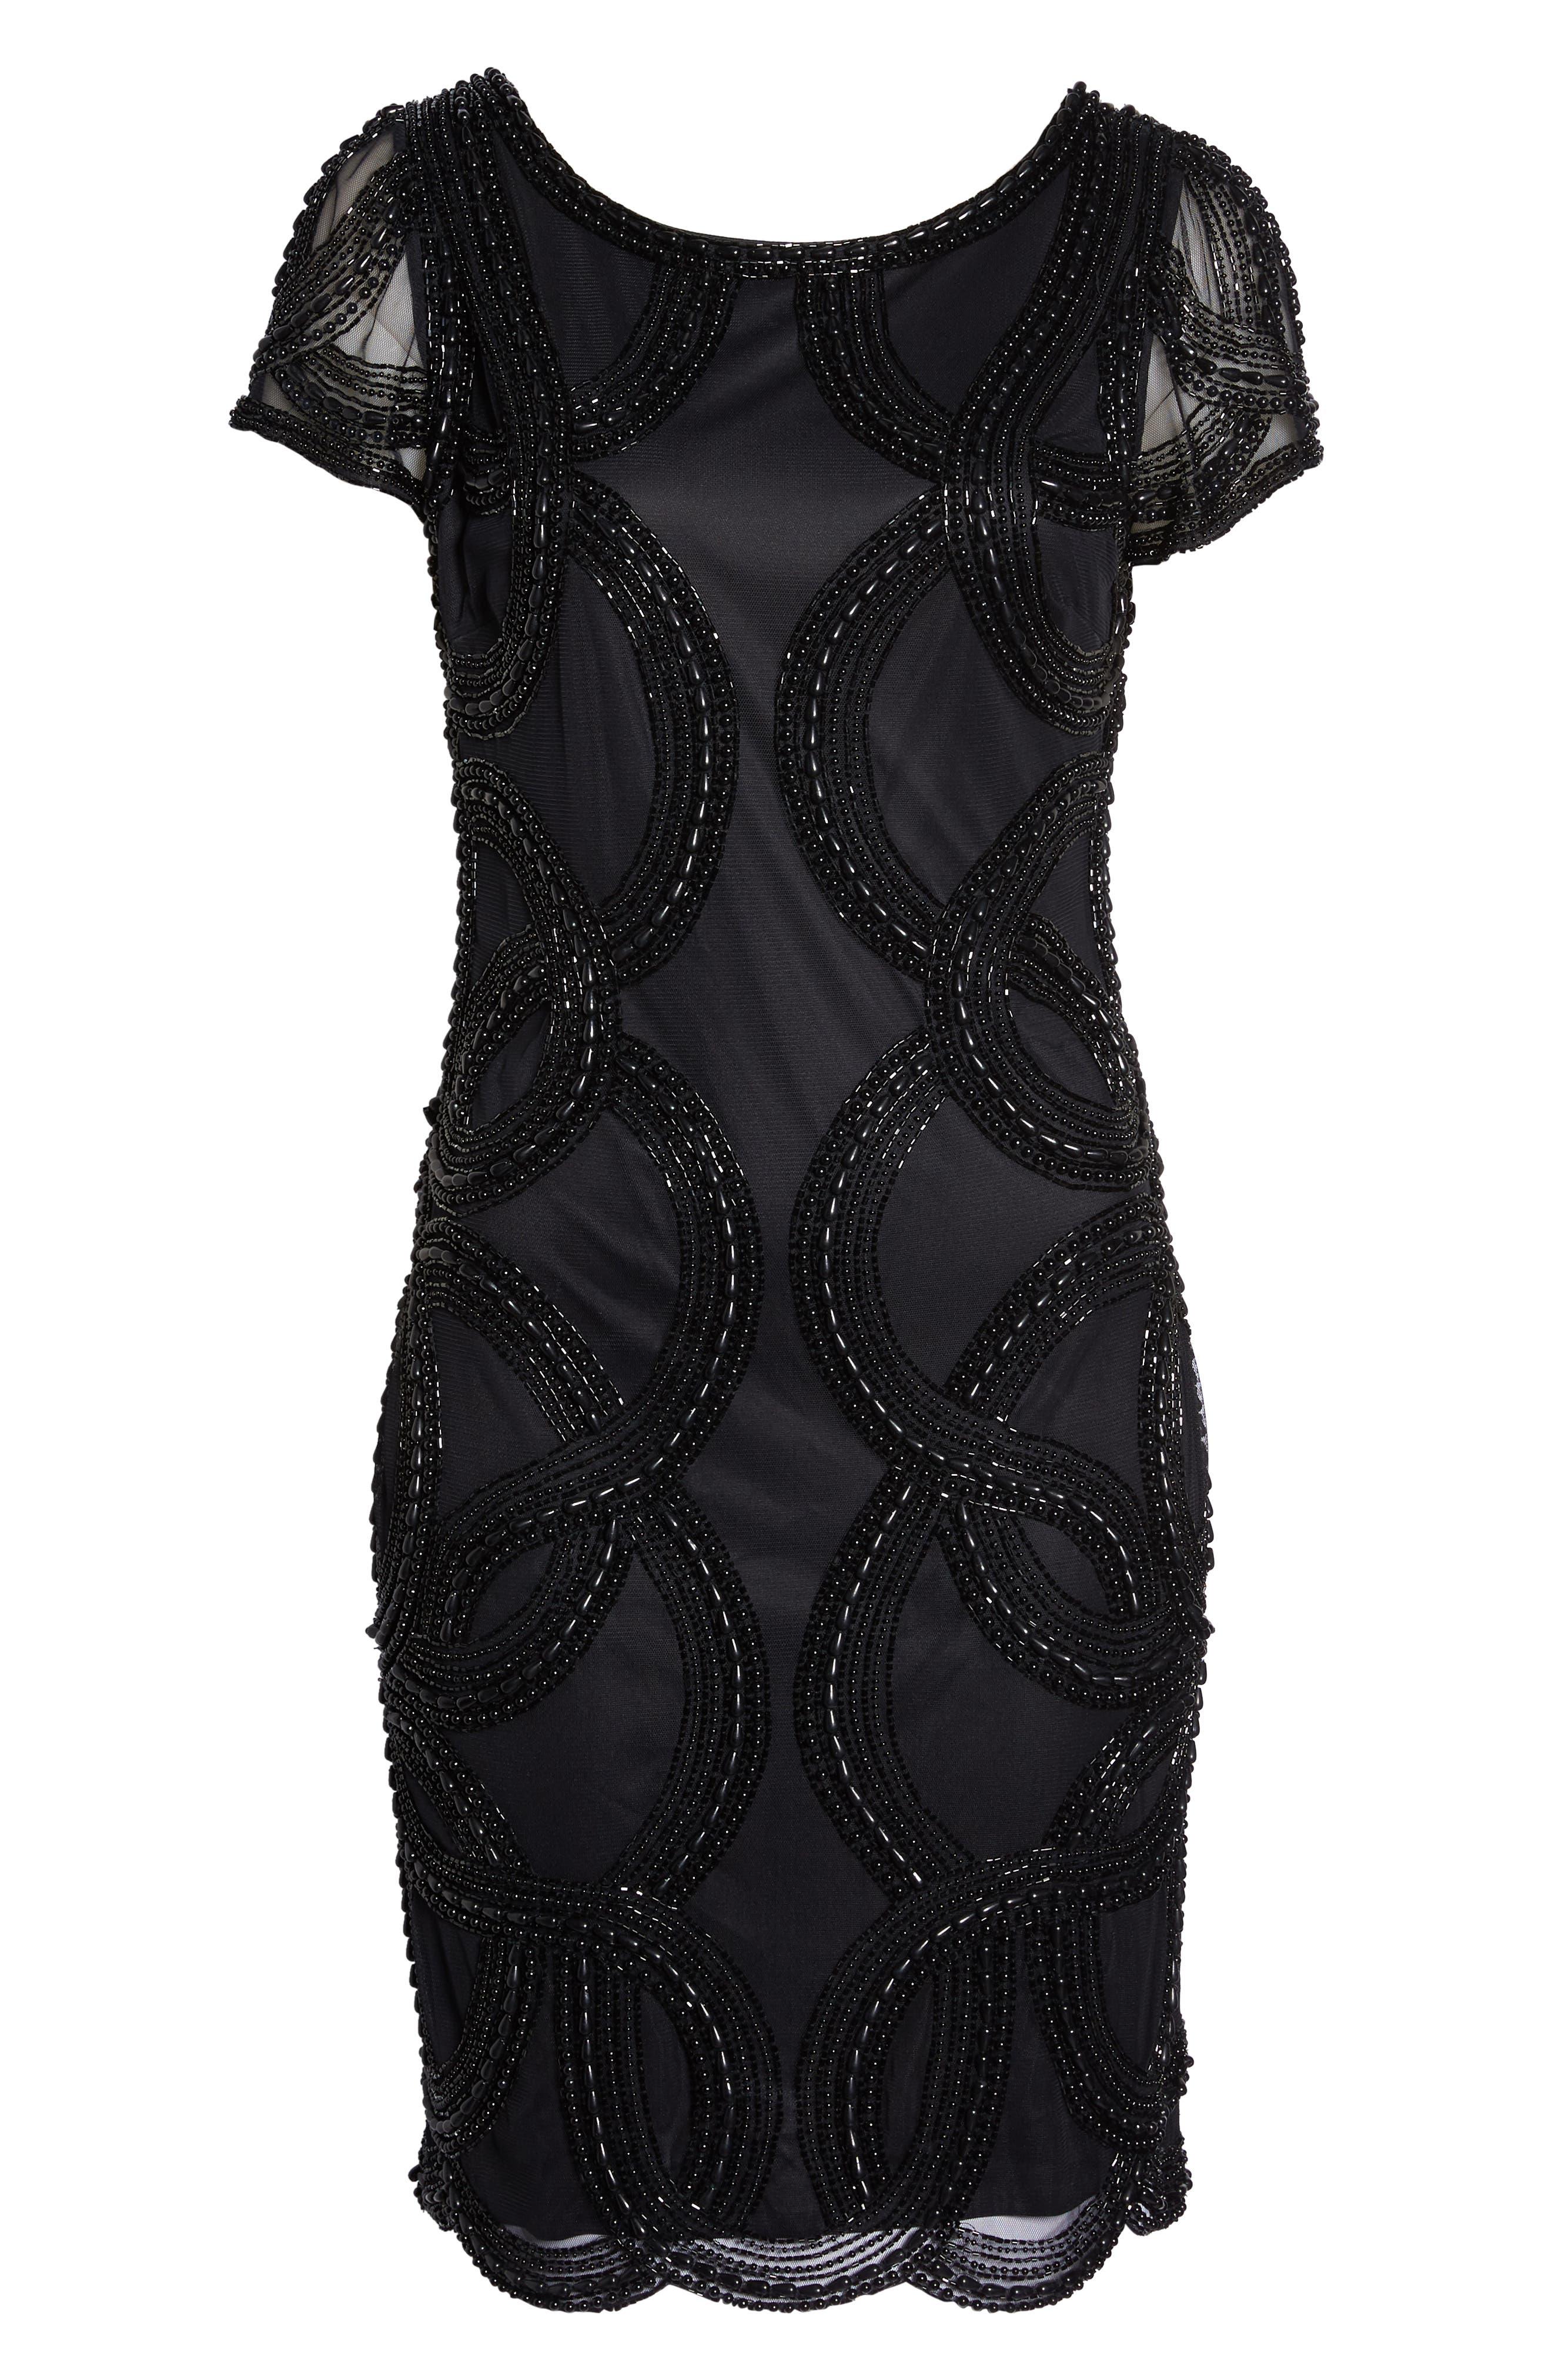 Beaded Swirls Cocktail Dress,                             Alternate thumbnail 7, color,                             BLACK